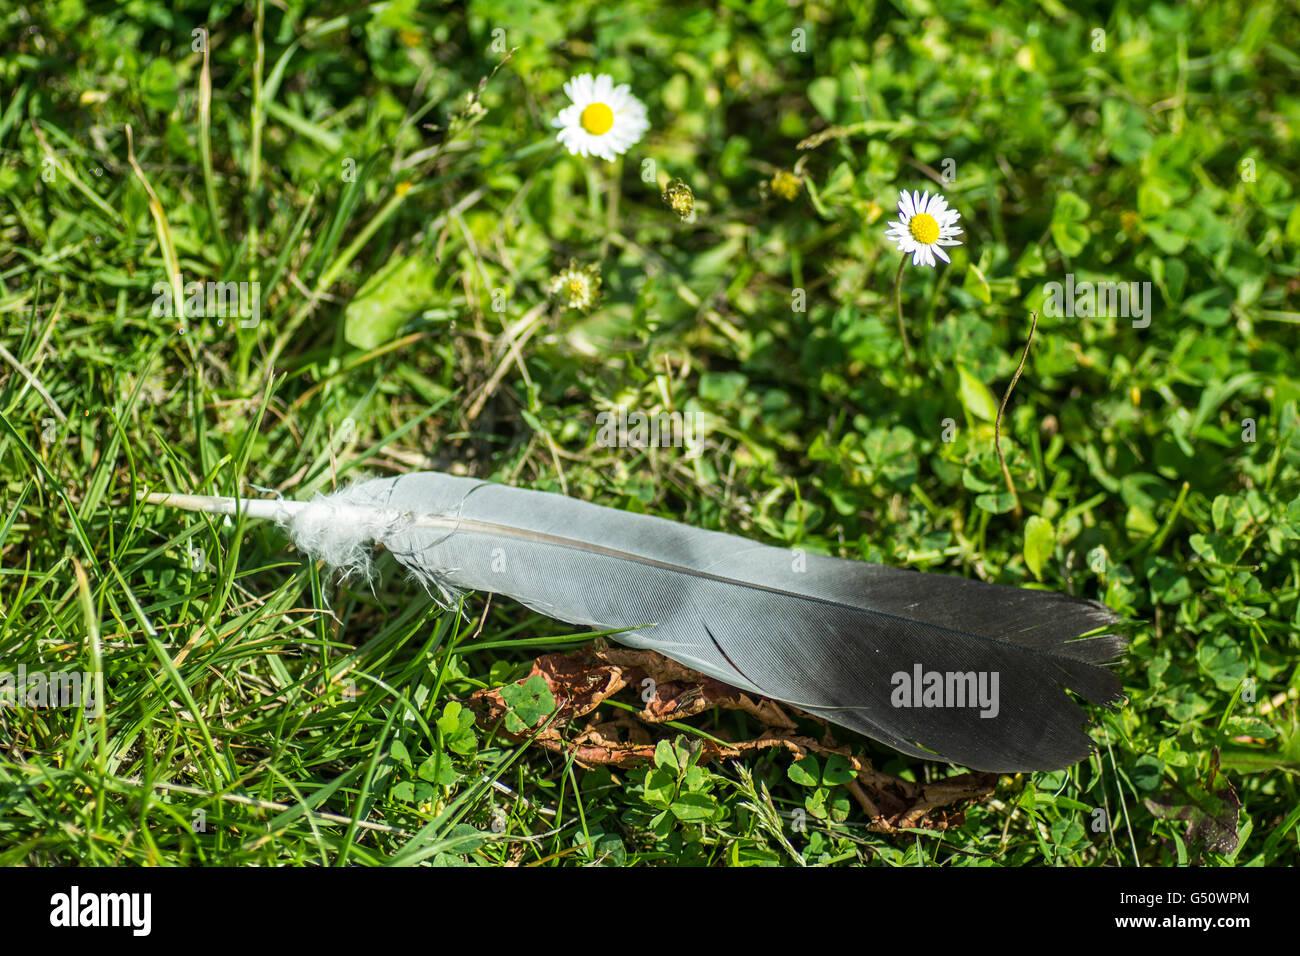 Seul oiseau plume sur l'herbe Photo Stock